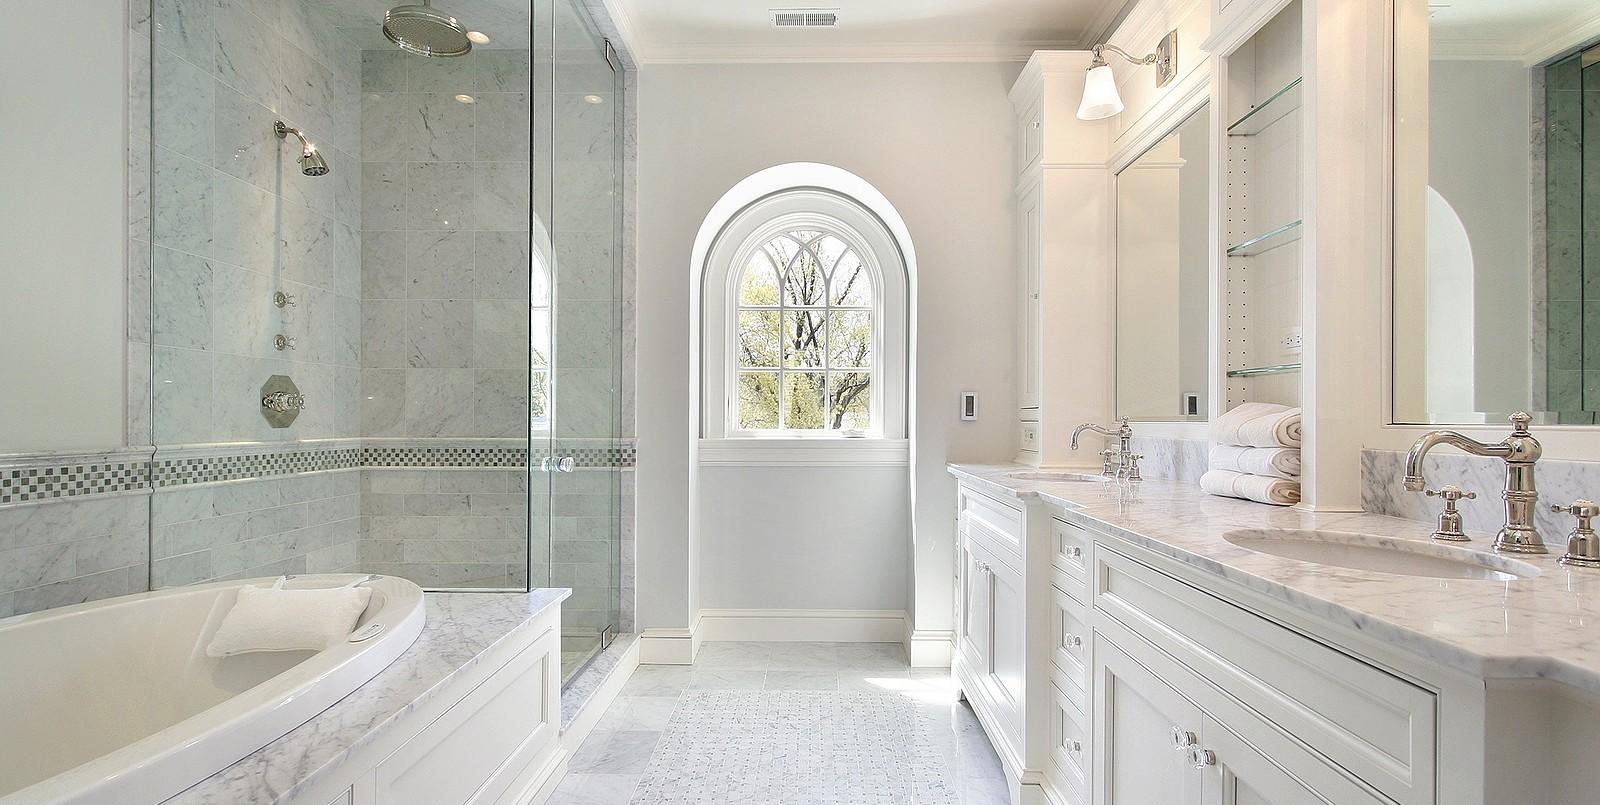 Fair Renovation & Construction | Bathroom